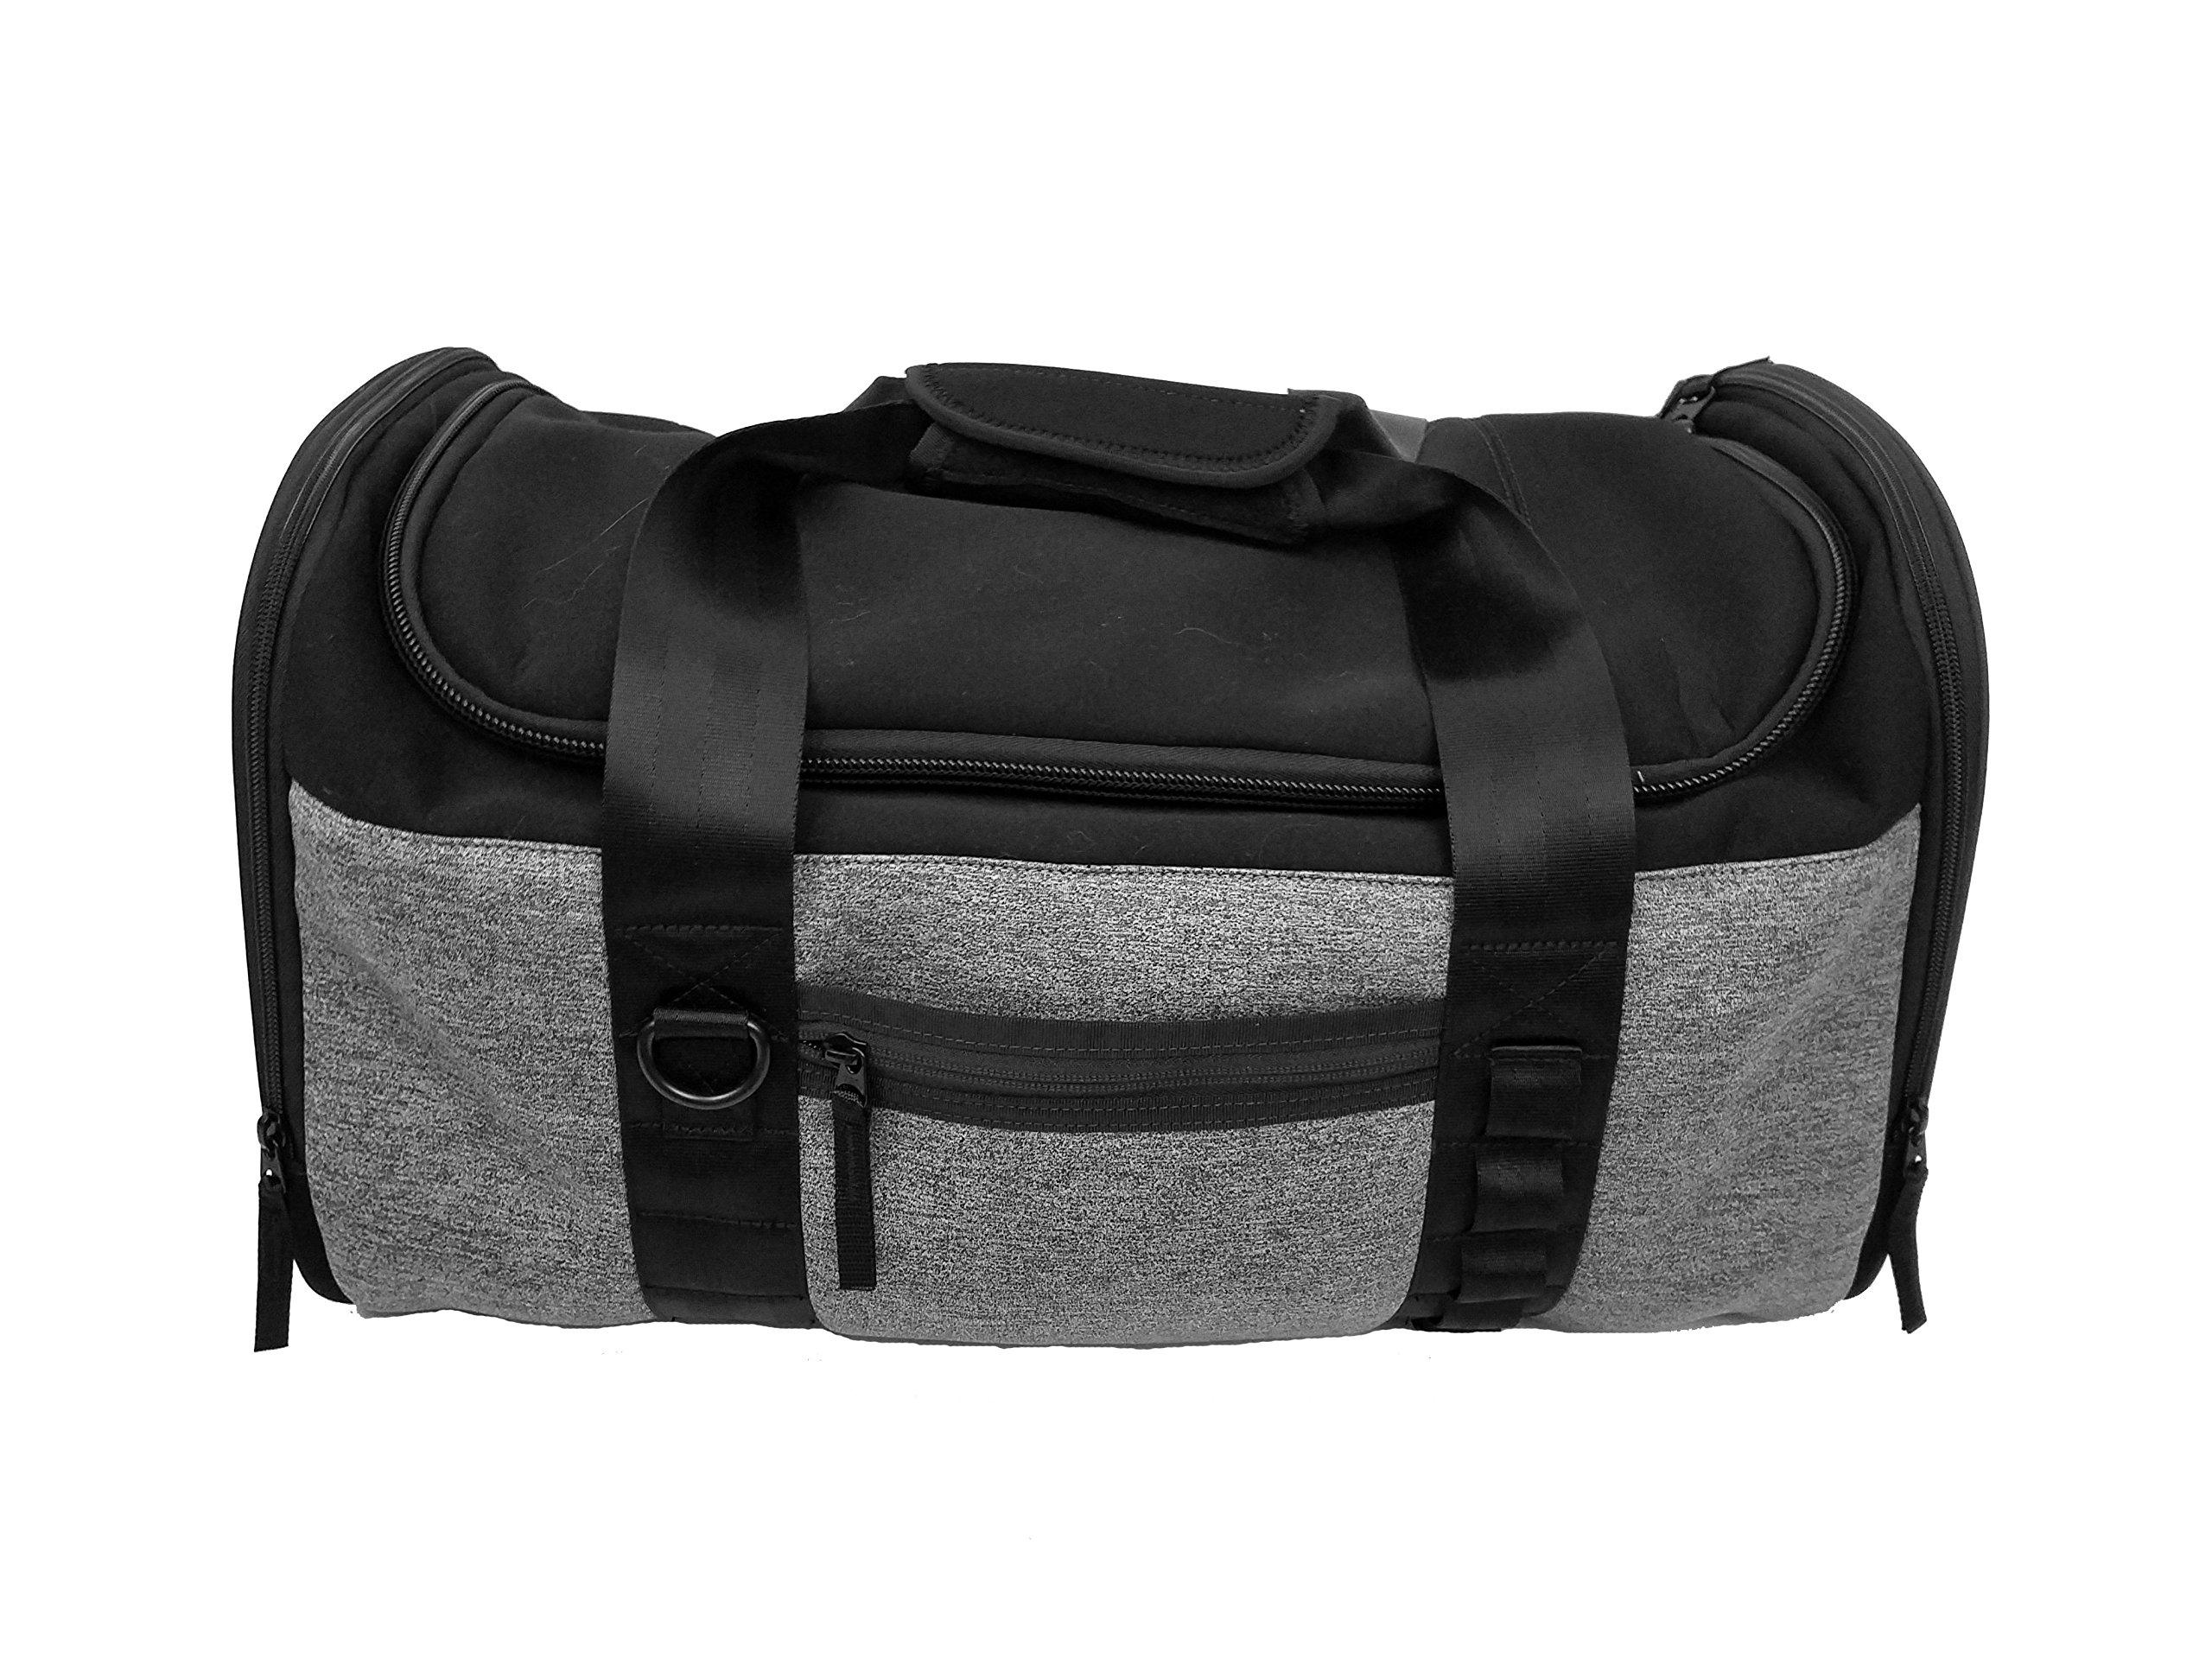 Smassy Stuff Large Gym Bag